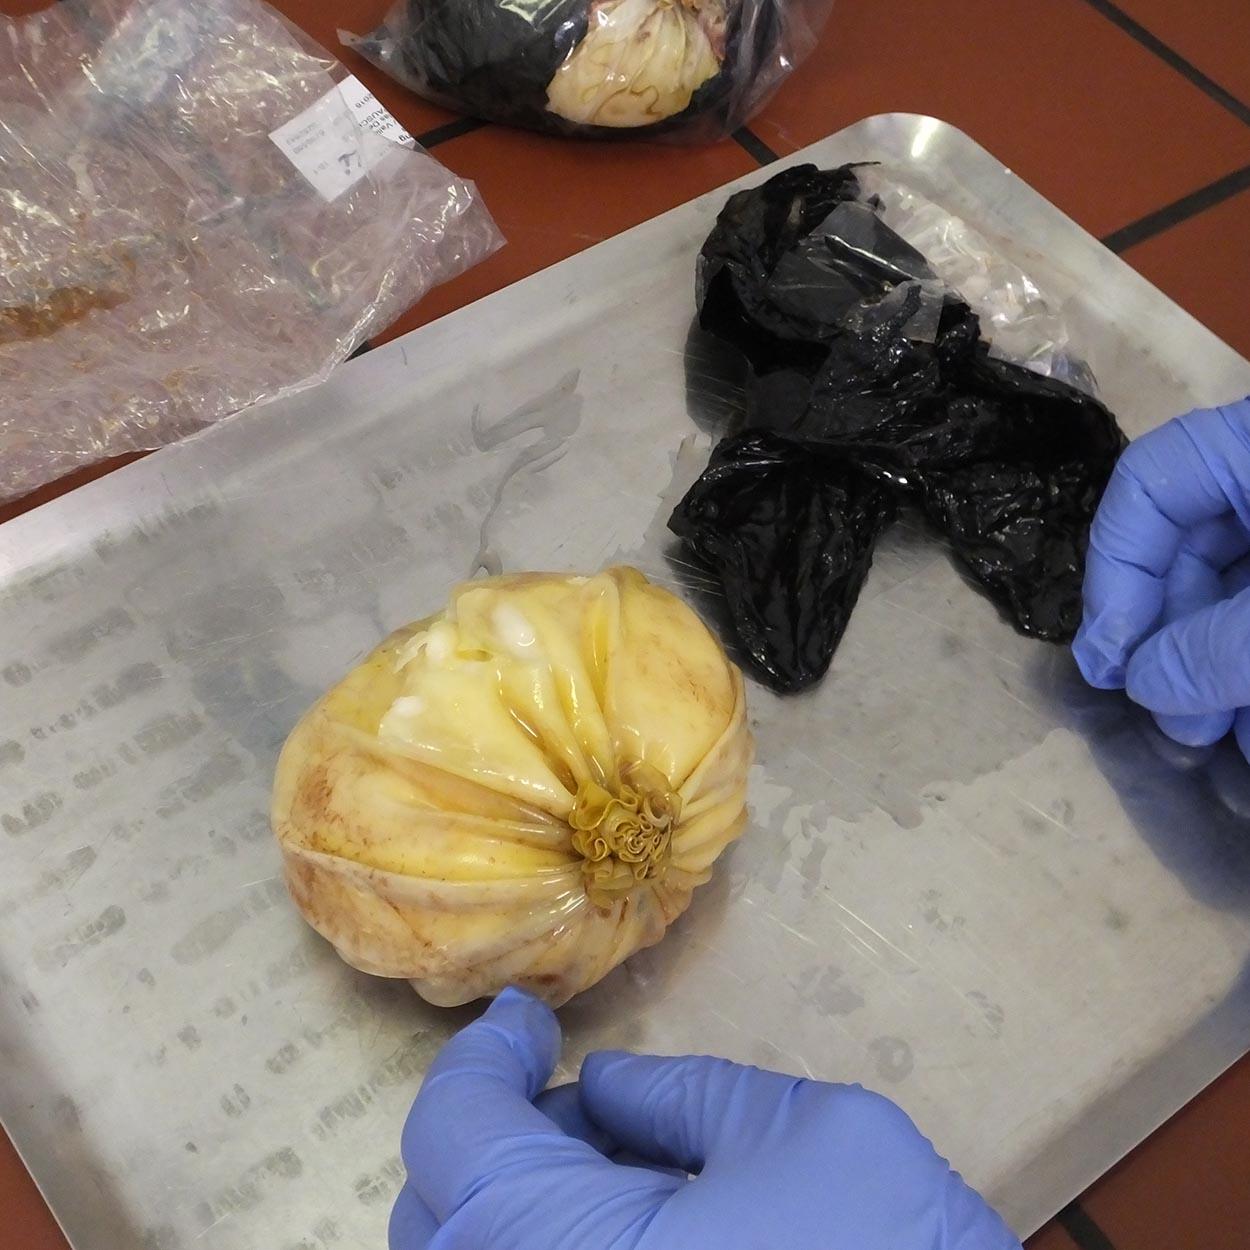 Die Brustimplantate mit Kokain-Teigmasse | Foto: ZFA Frankfurt